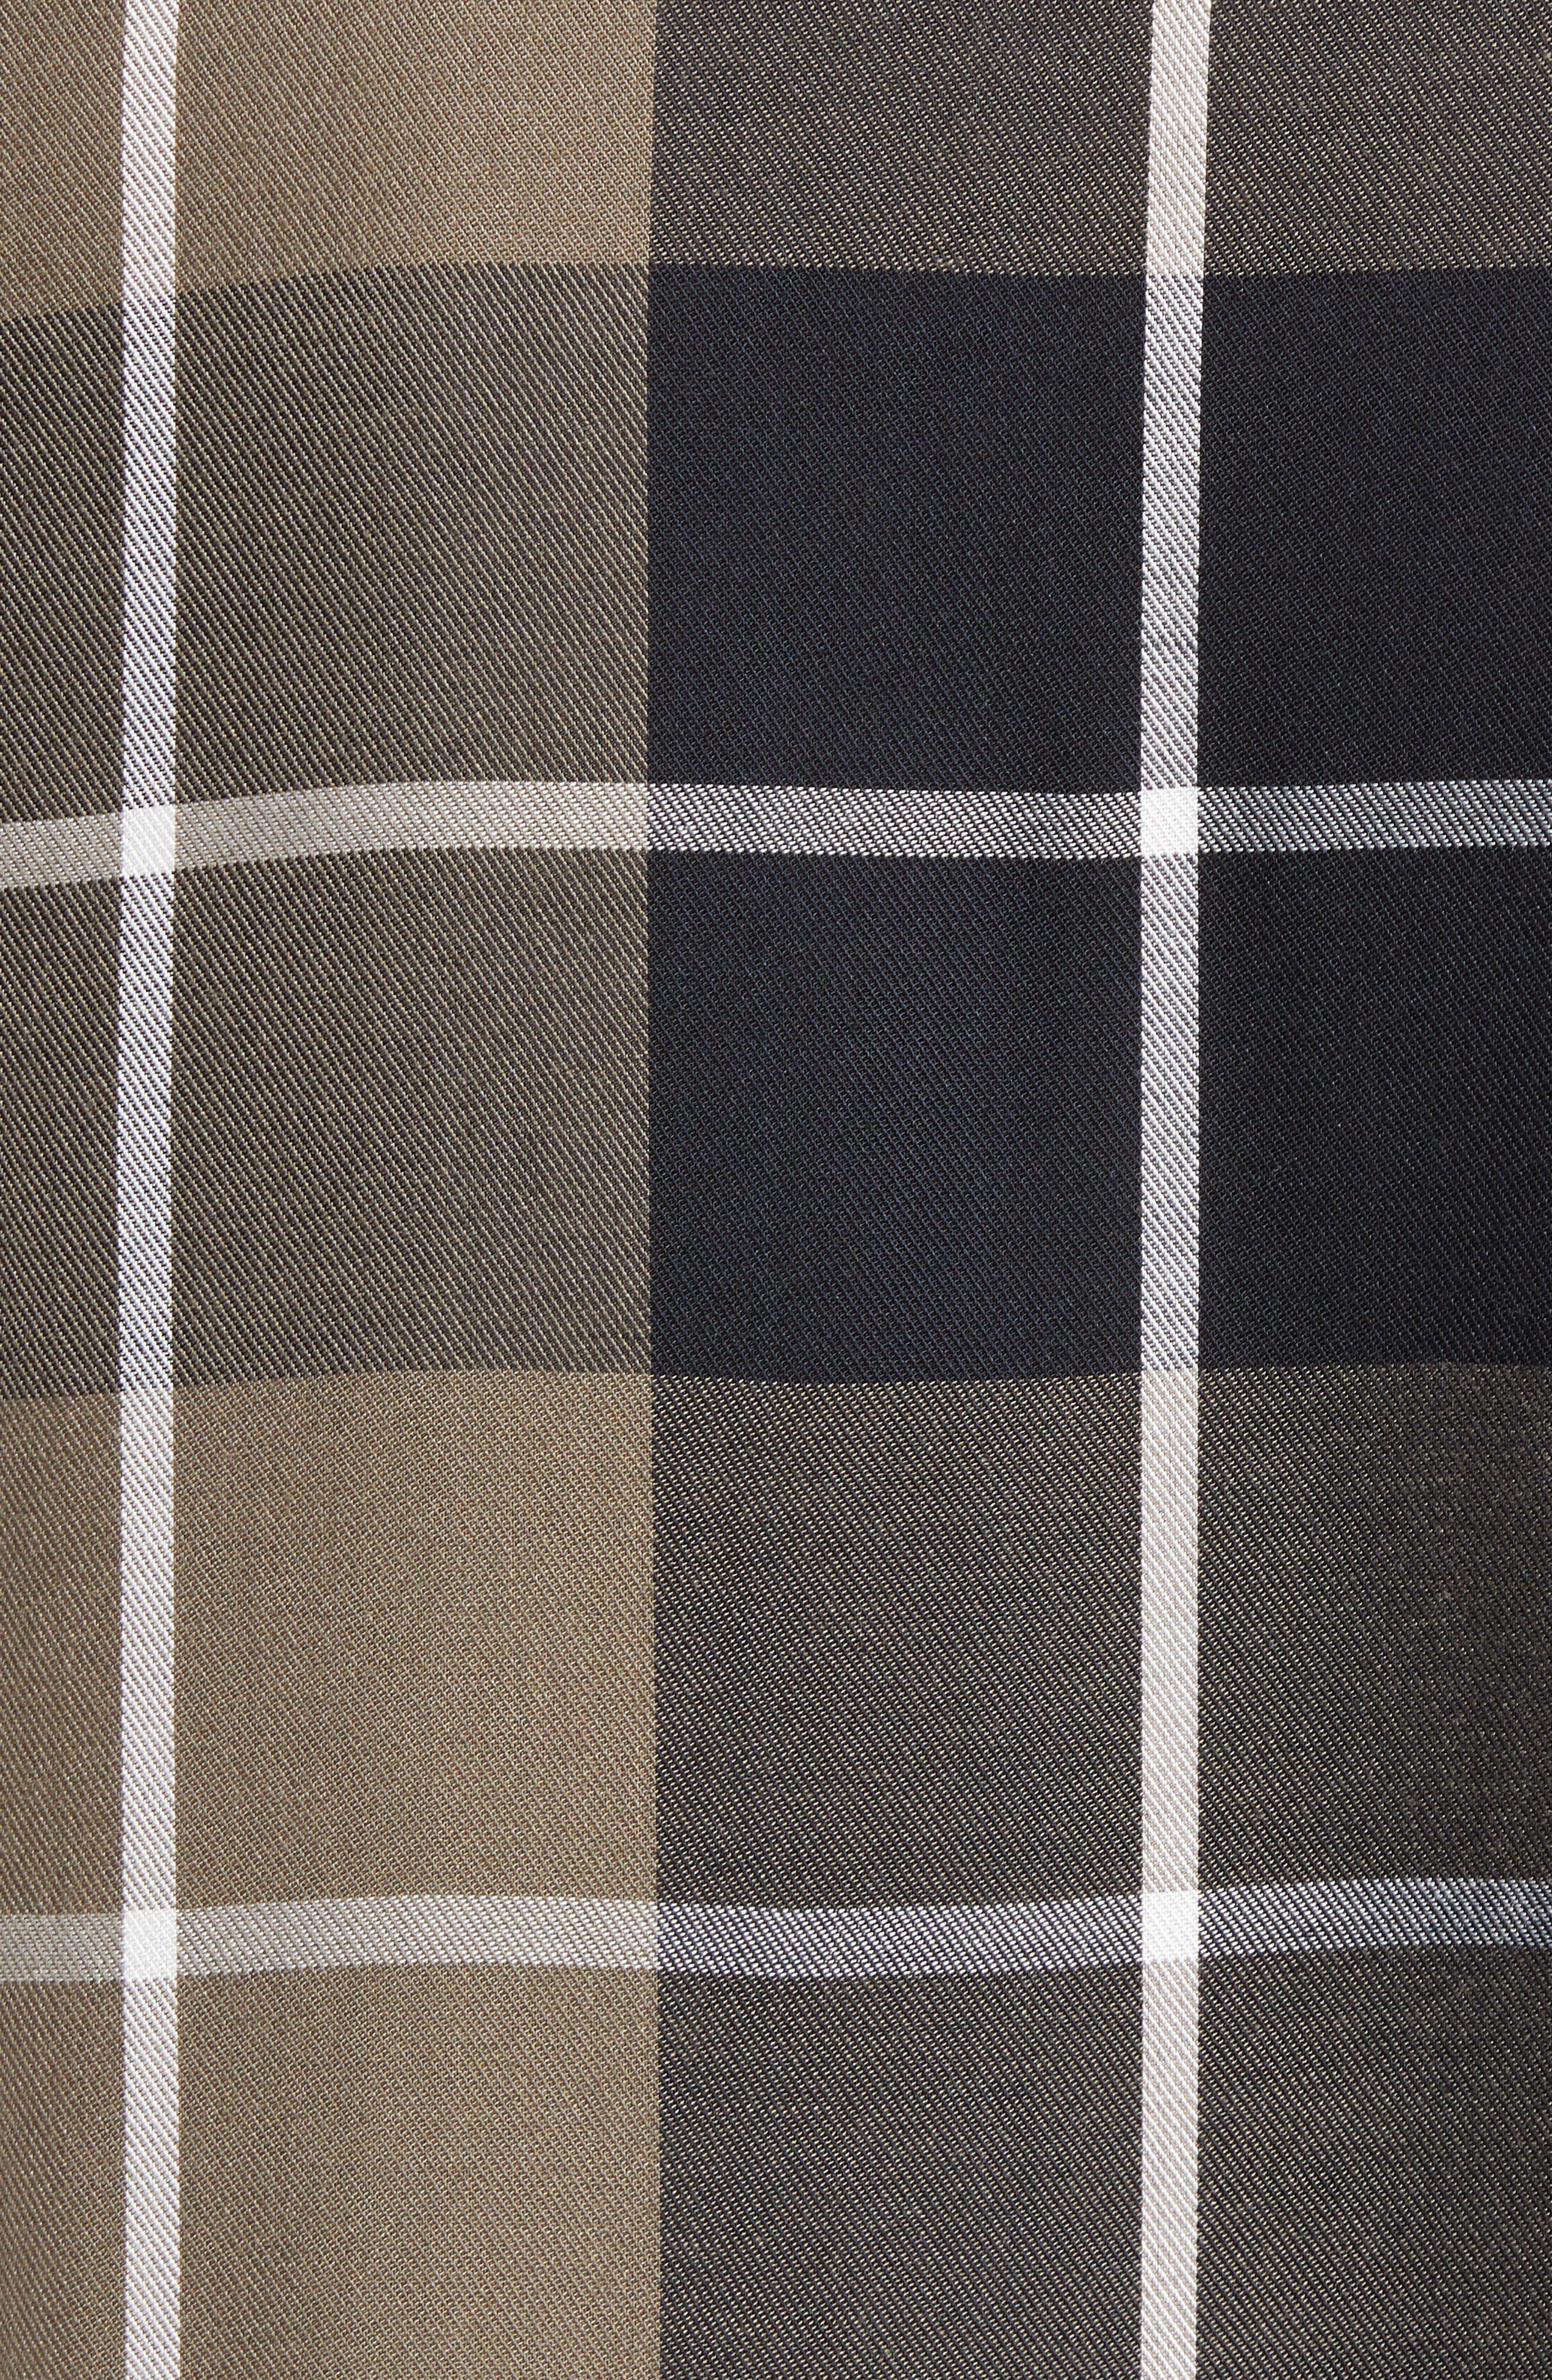 Ruffled Plaid Shirt,                             Alternate thumbnail 6, color,                             001